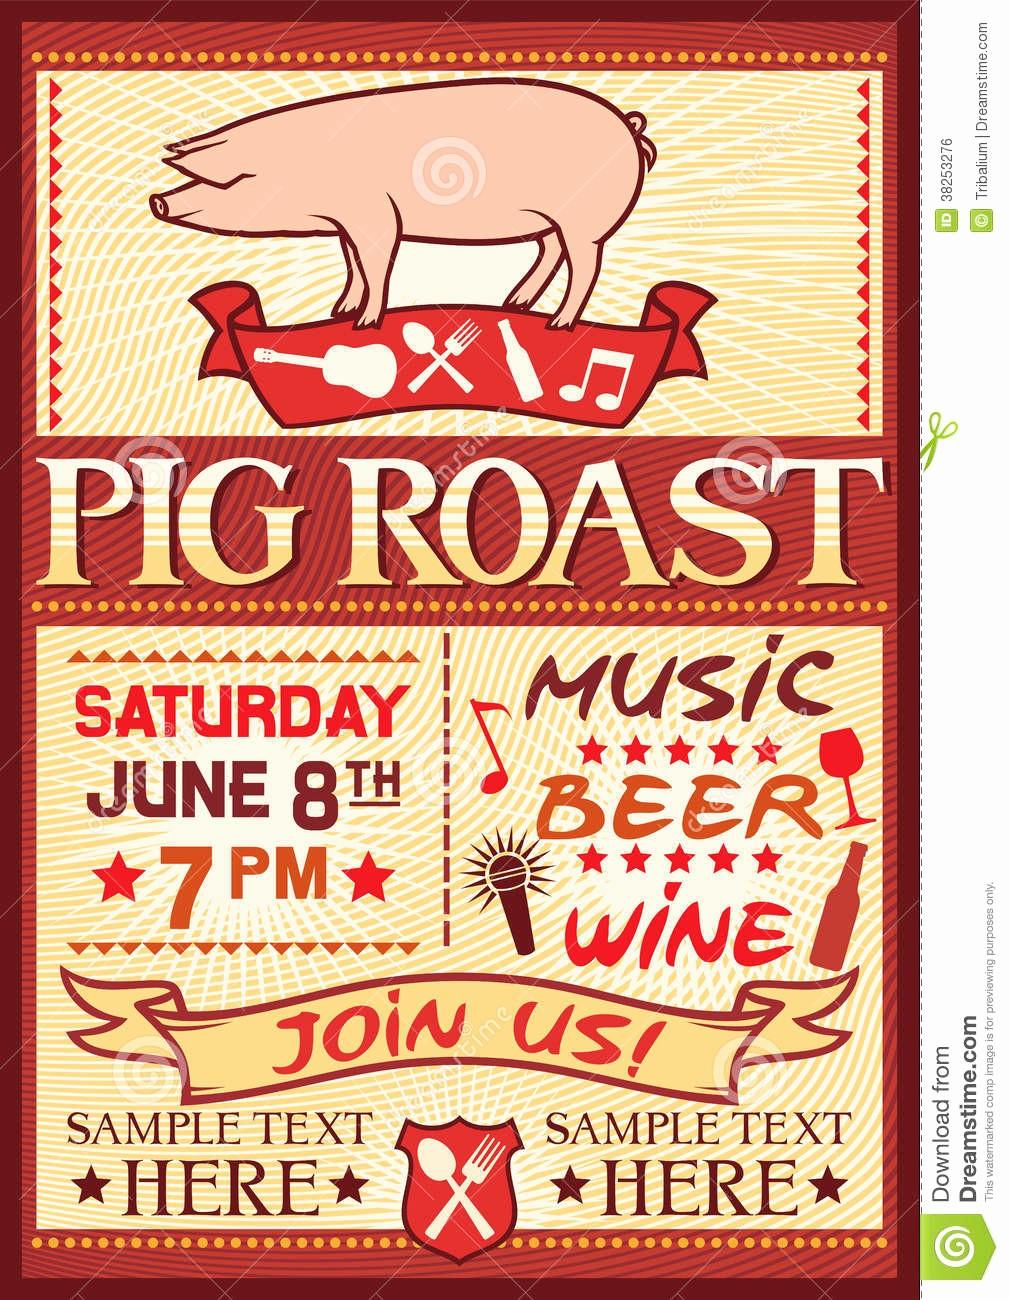 Pig Roast Invitation Template Free Beautiful Pig Roast Poster Stock Vector Illustration Of Fire